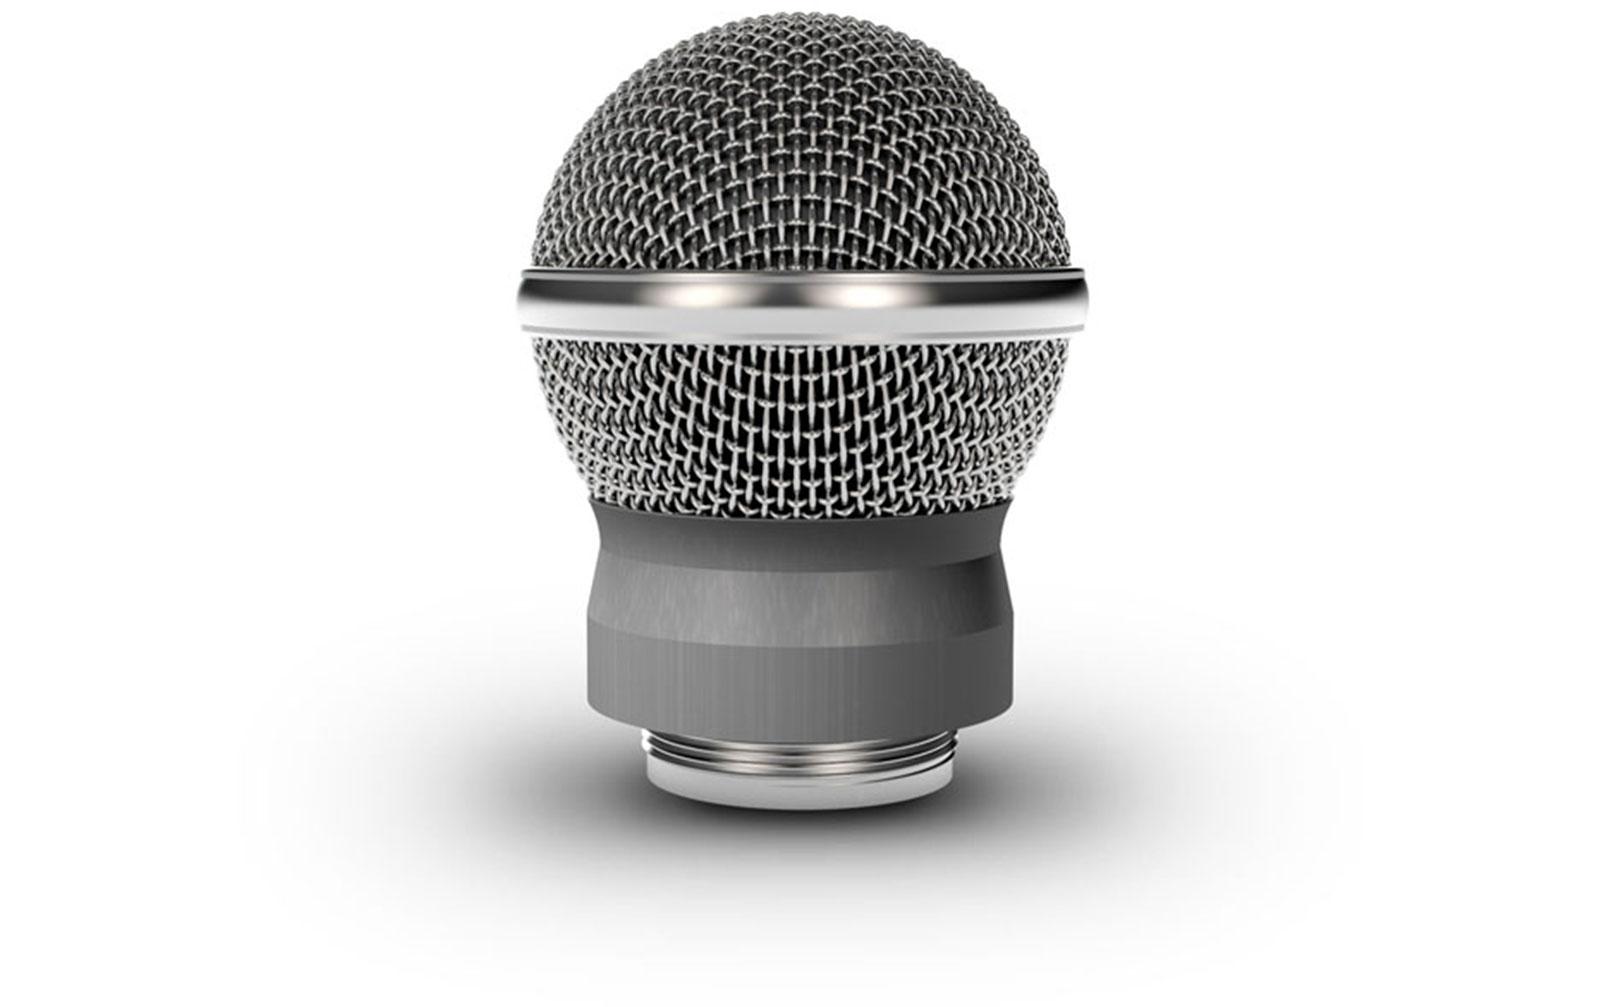 ld-systems-u500-dc-dynamischer-mikrofonkopf-mit-nierencharakteristik